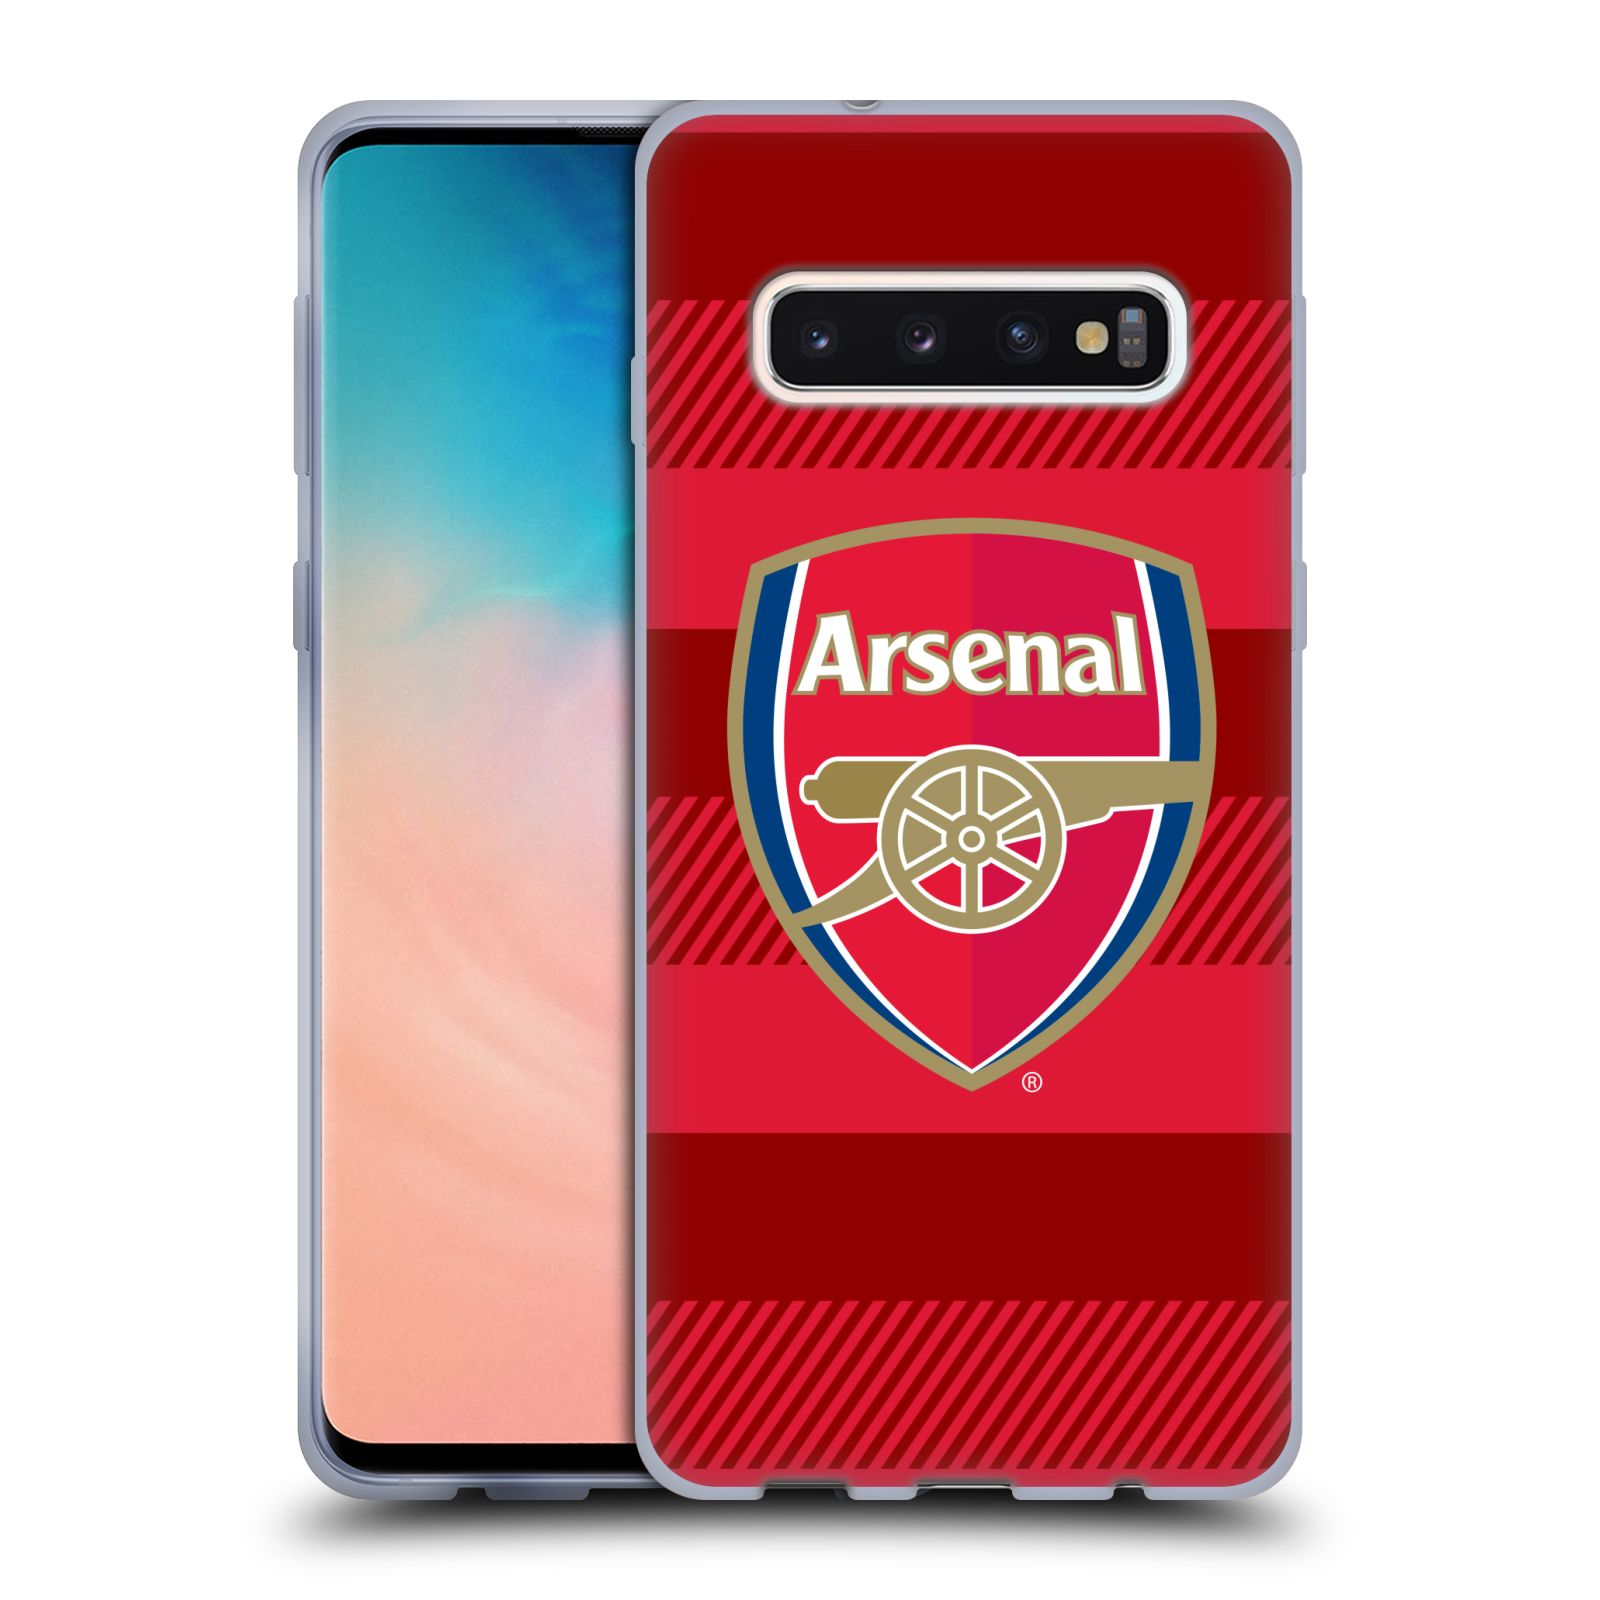 Silikonové pouzdro na mobil Samsung Galaxy S10 - Head Case - Arsenal FC - Logo s pruhy